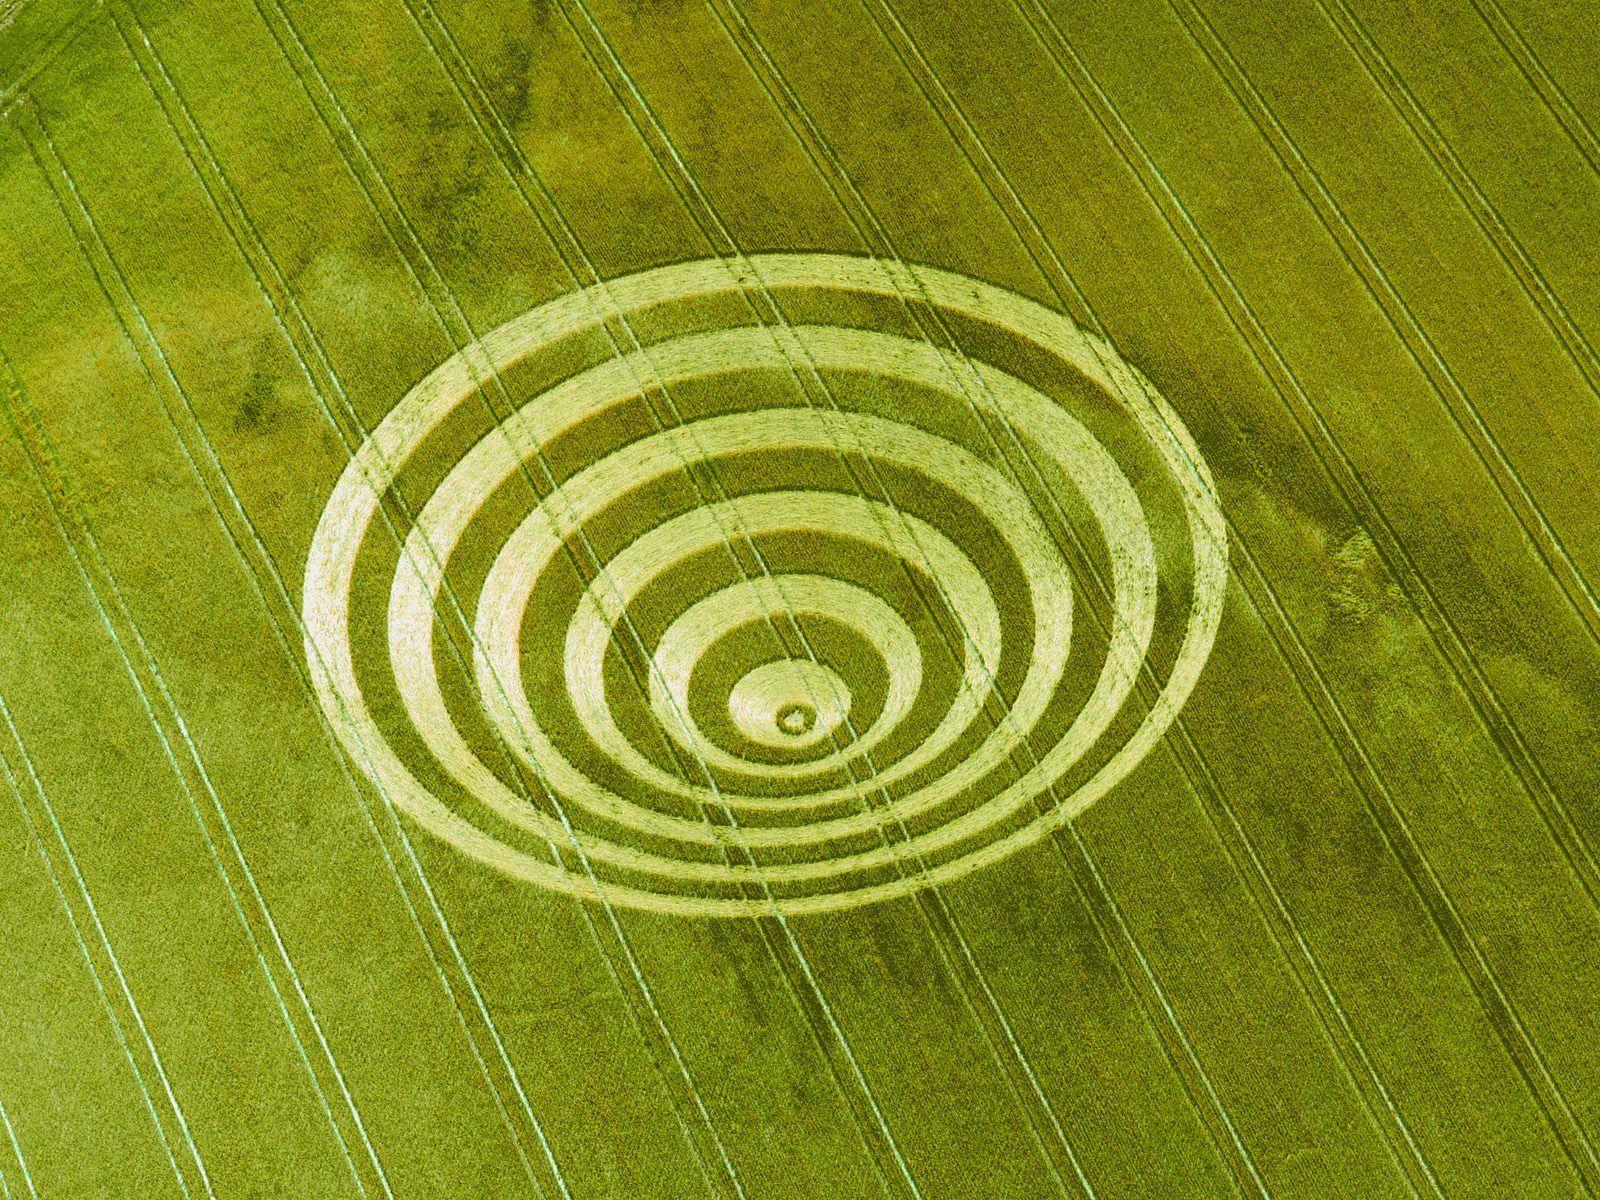 Crop Circles Wallpapers Crop Circles Crop Circles 2016 Circle